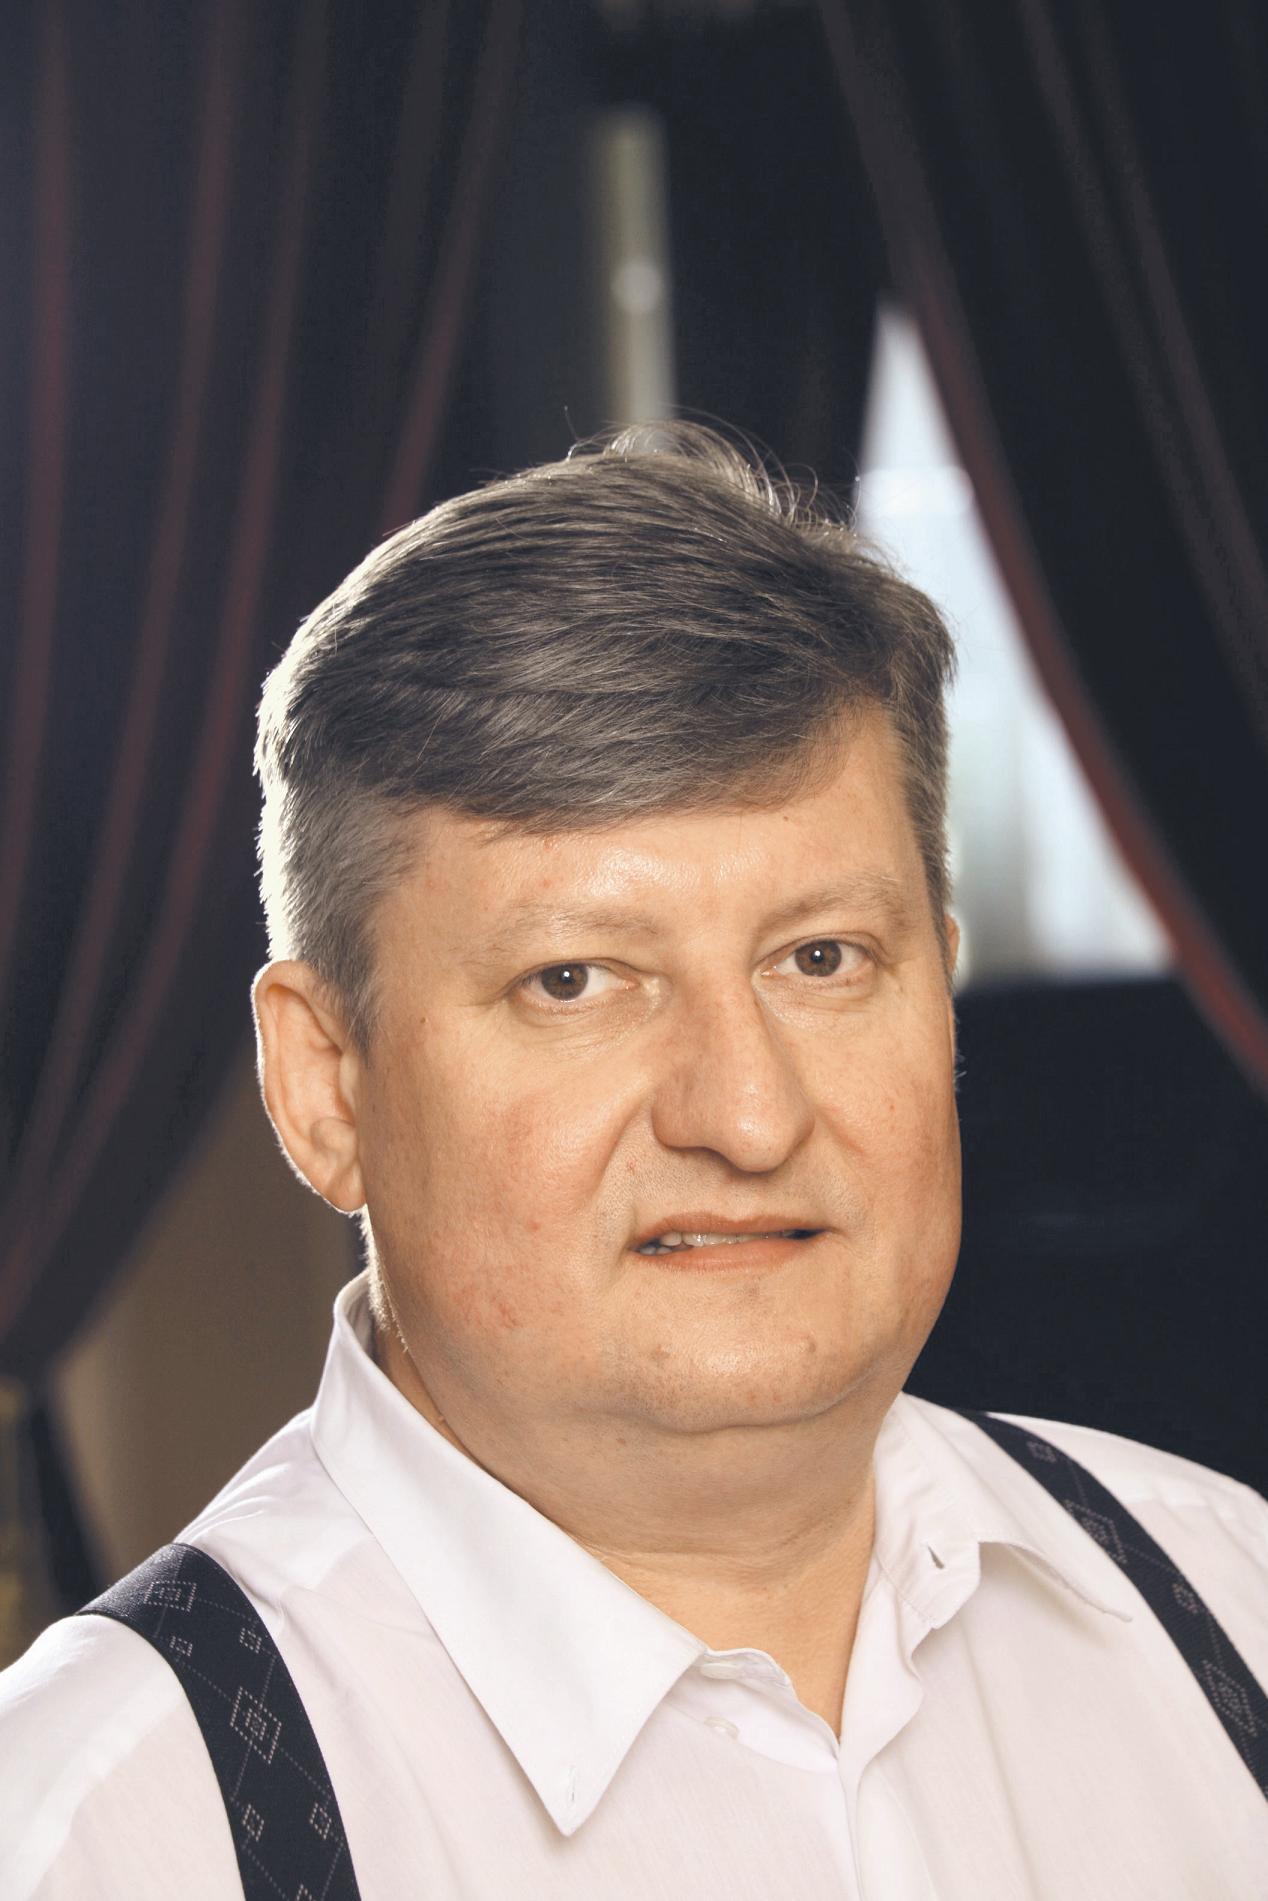 Wojciech nagel igte remove jackpots casino